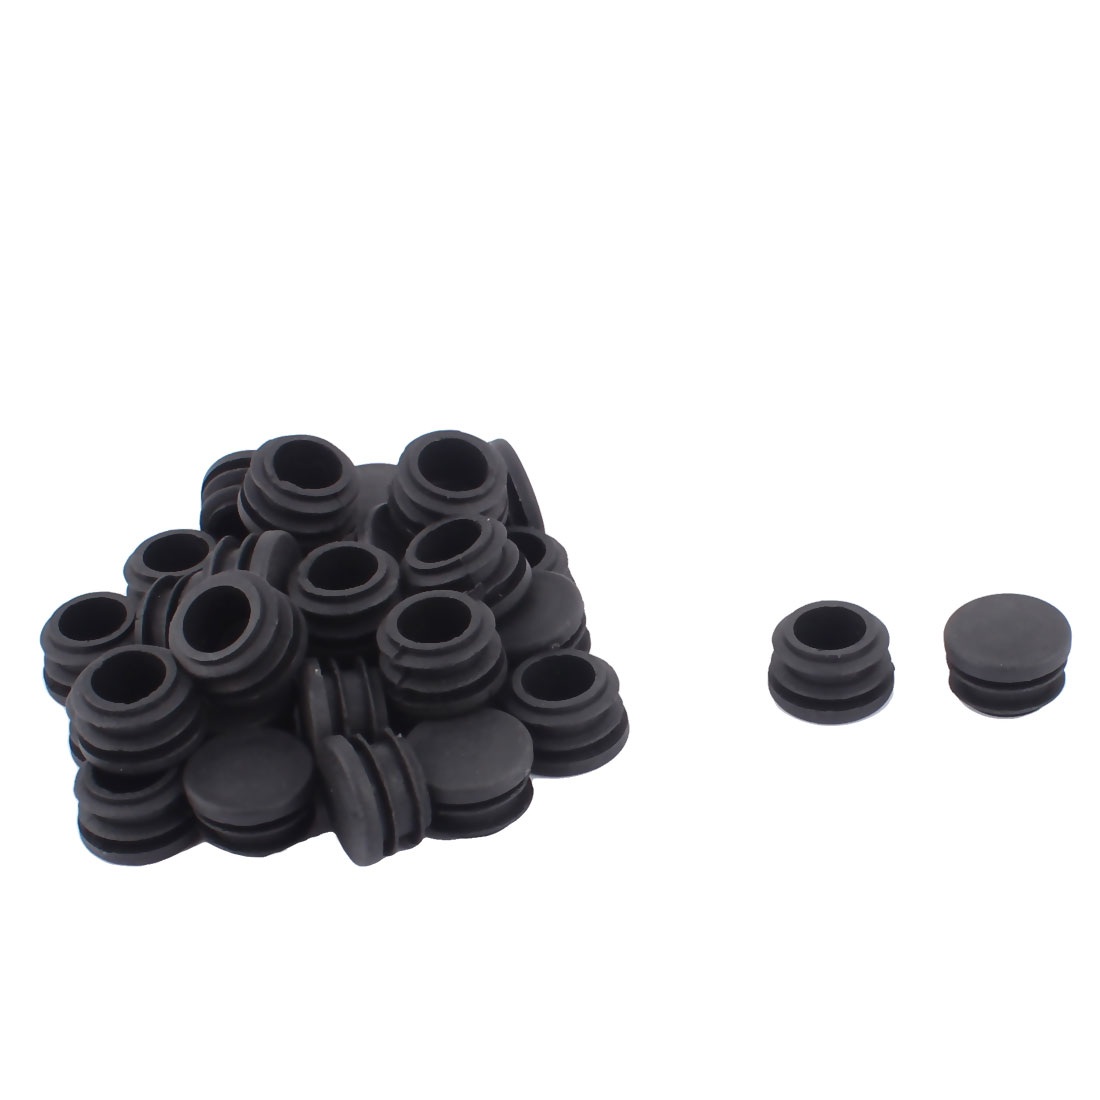 30pcs 22mm Diameter Black Plastic Protect Protecting Tubing Round Tube Inserts